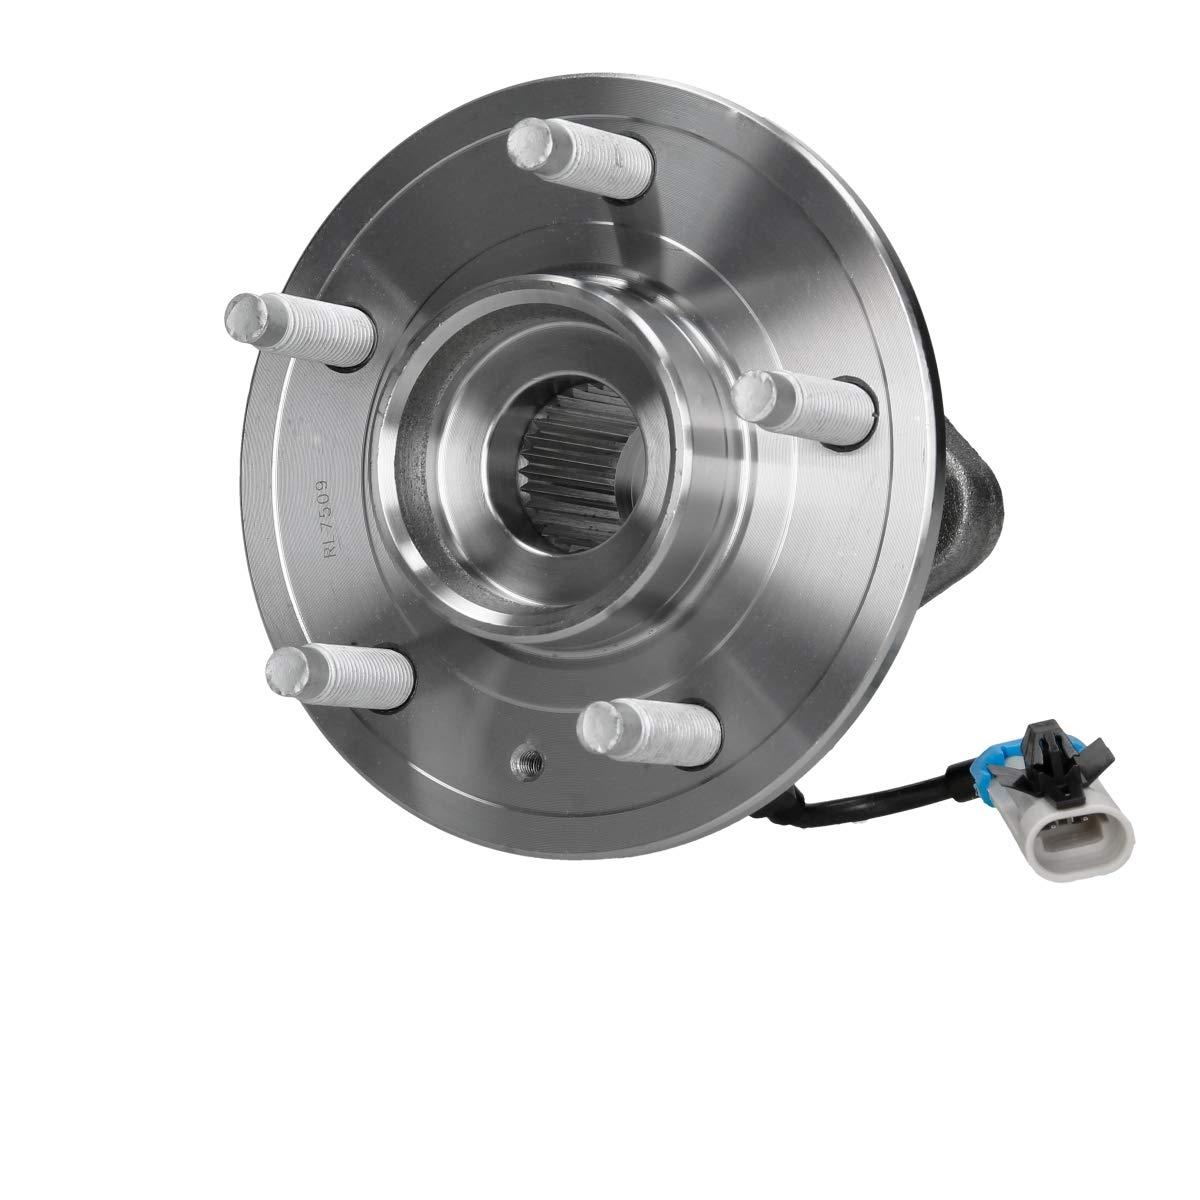 ECD Germany RL7509 Radlagersatz Radlager Satz Radnabe mit ABS-Sensor vorne VA 5-Loch Felge